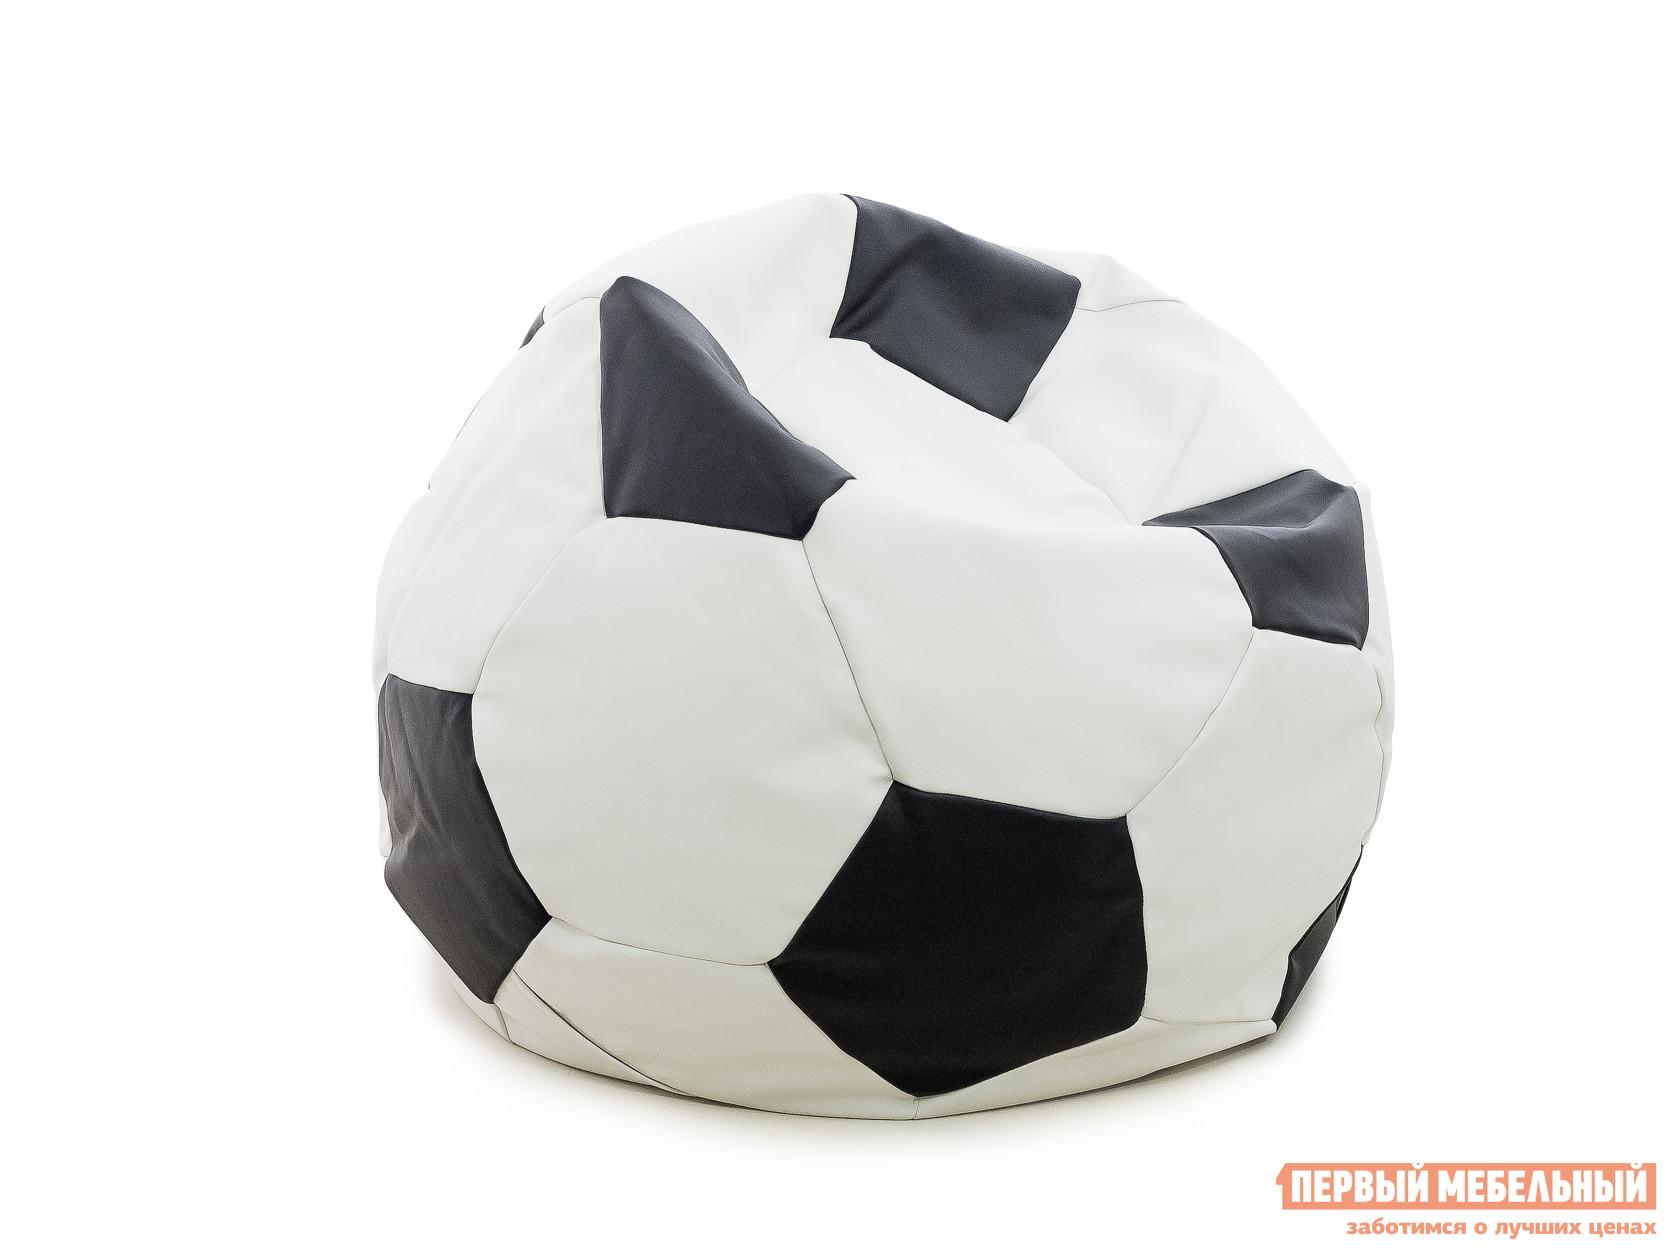 Кресло-мяч DreamBag Мяч кресло мешок dreambag мяч баскетбольный